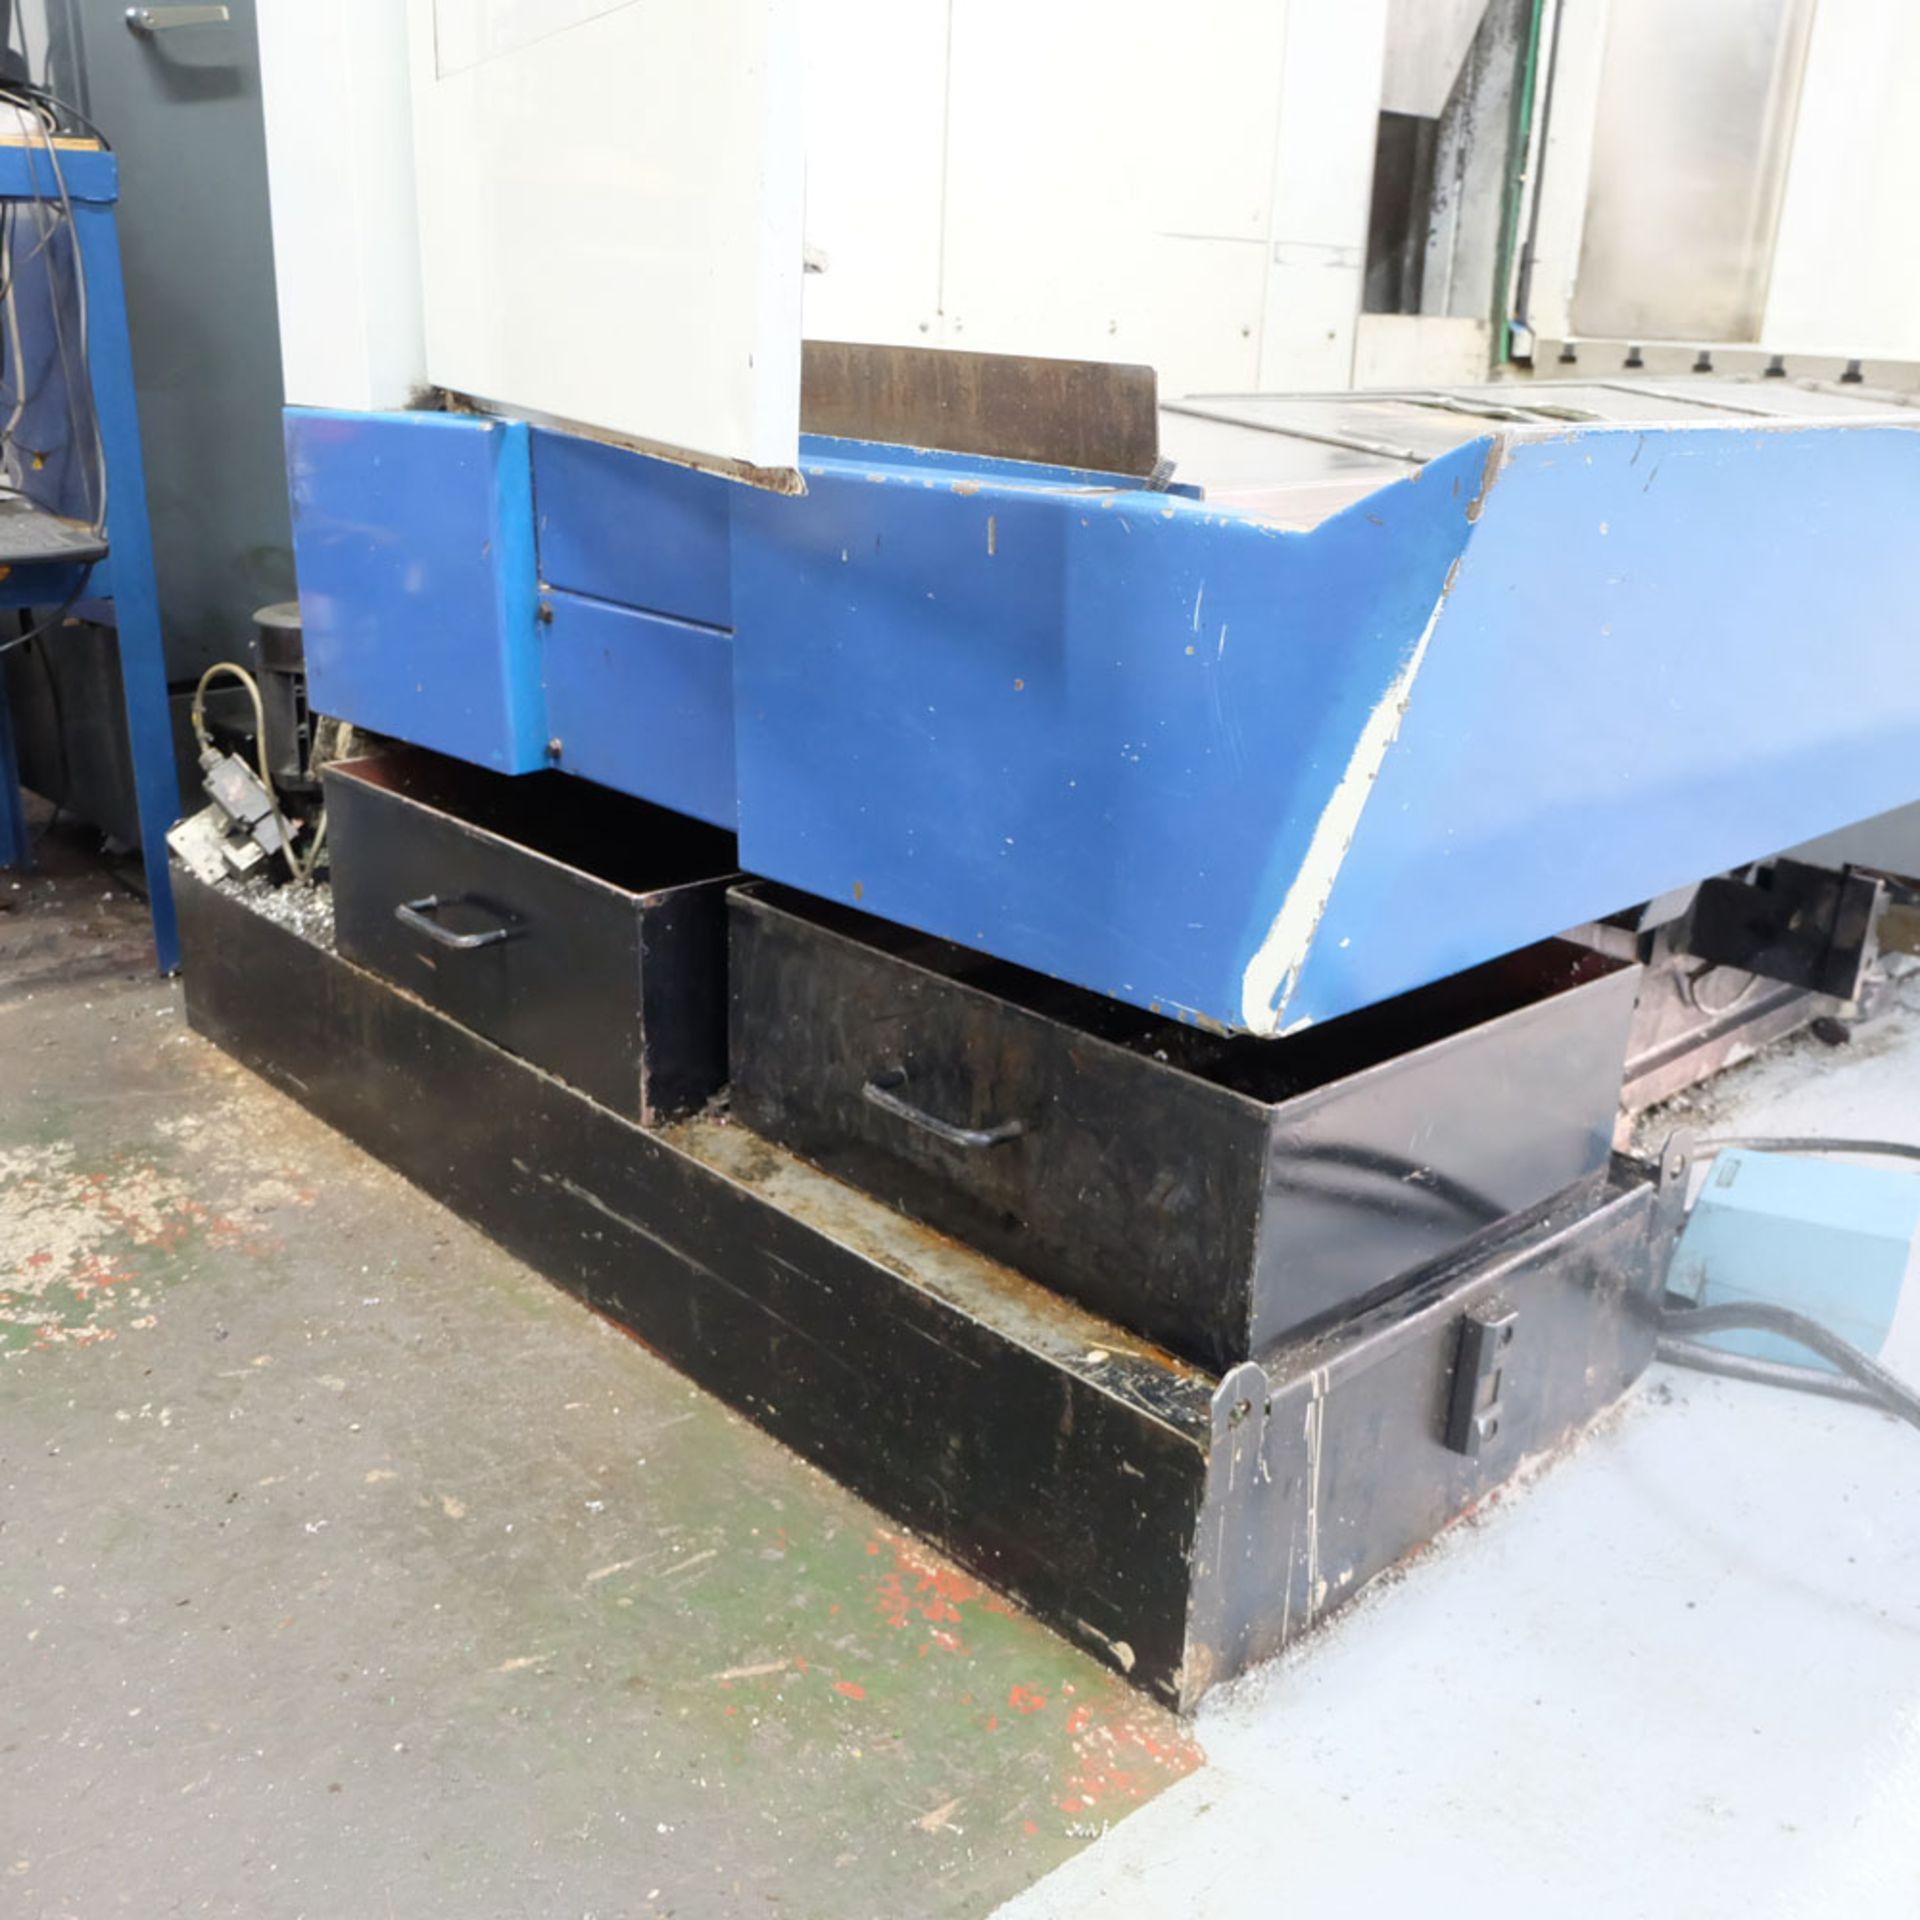 Huron GX 411 F Bed Type Milling Machine. Control Unit: CNC (HEIDENHAIN TNC 415B) - Image 11 of 12